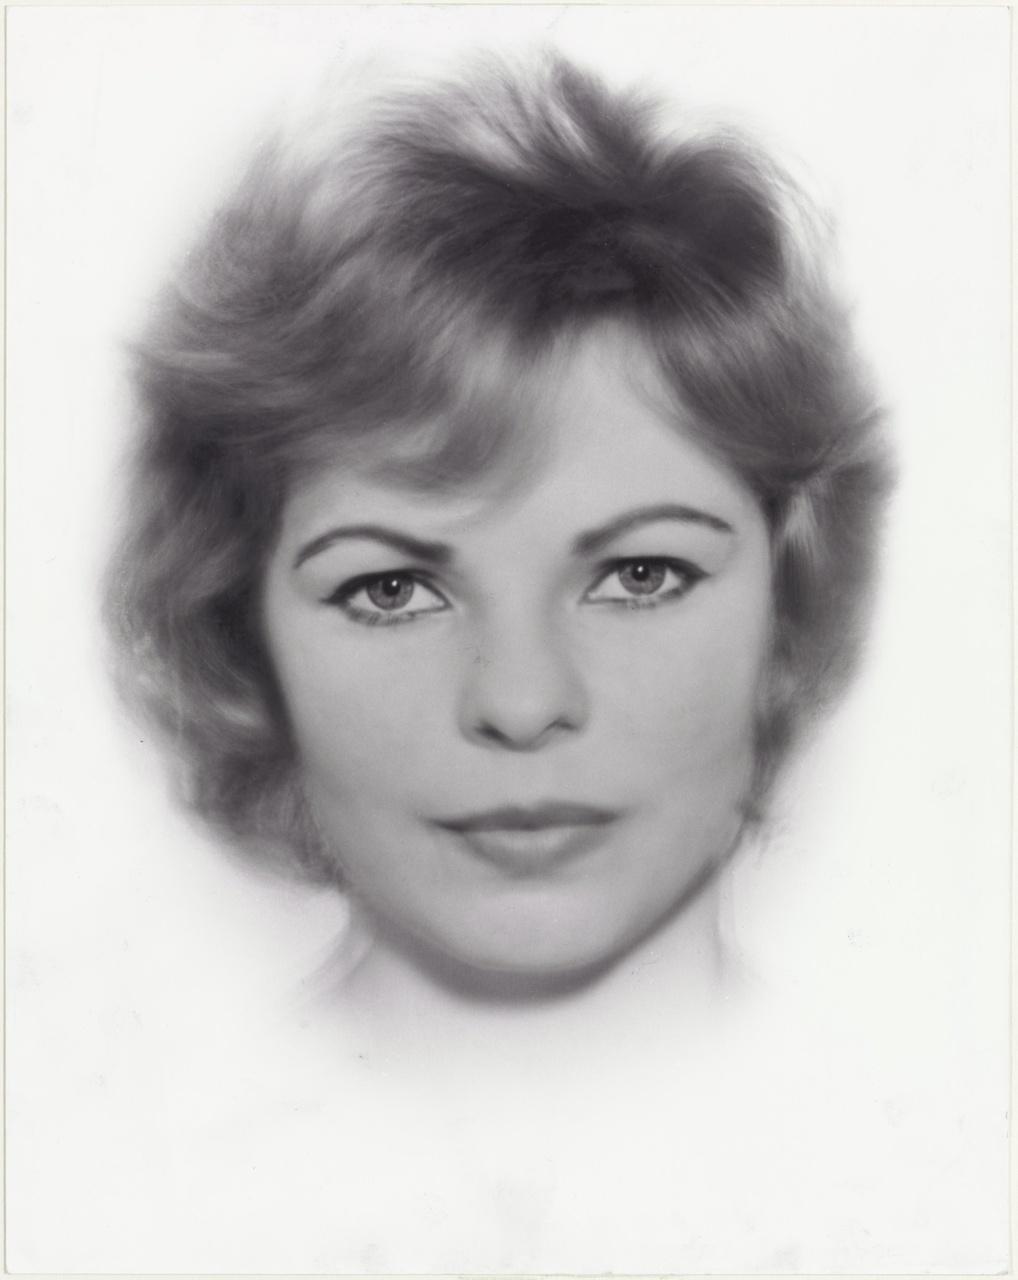 Hilde de B. Gemiddeld portret, circa 16 foto's